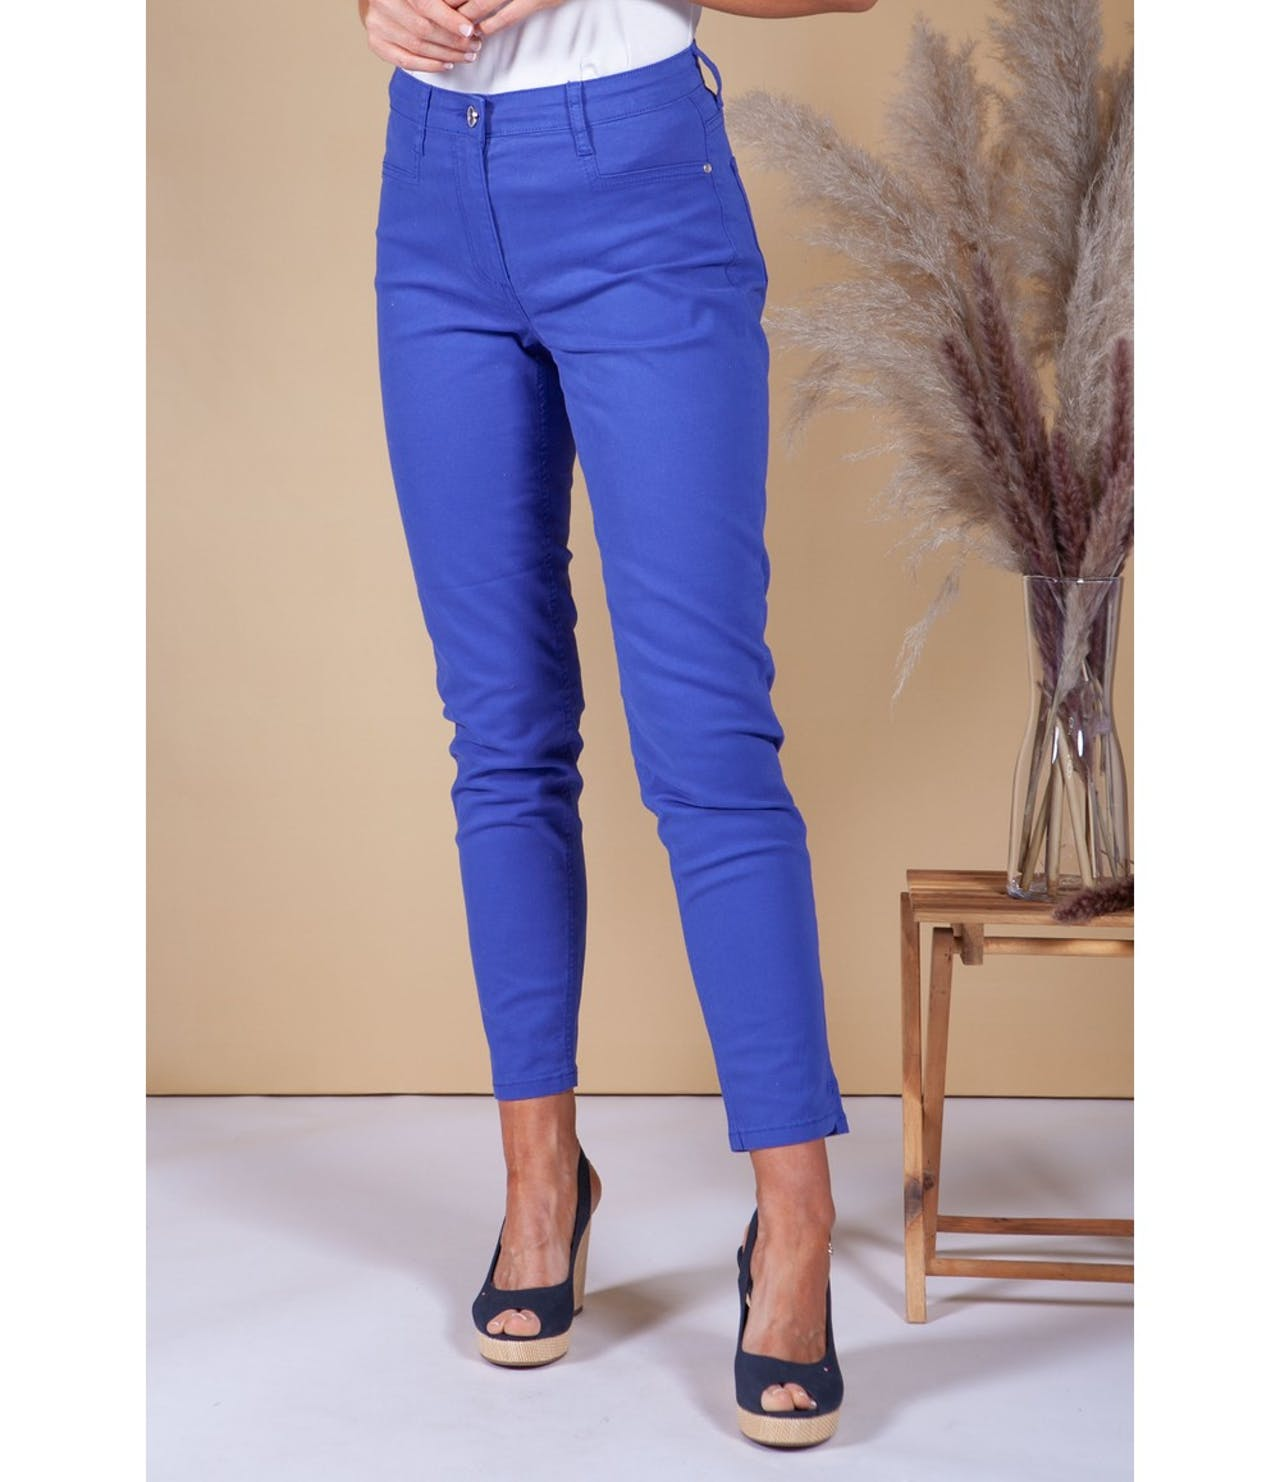 Betty Barclay Royal Blue Cotton Jean